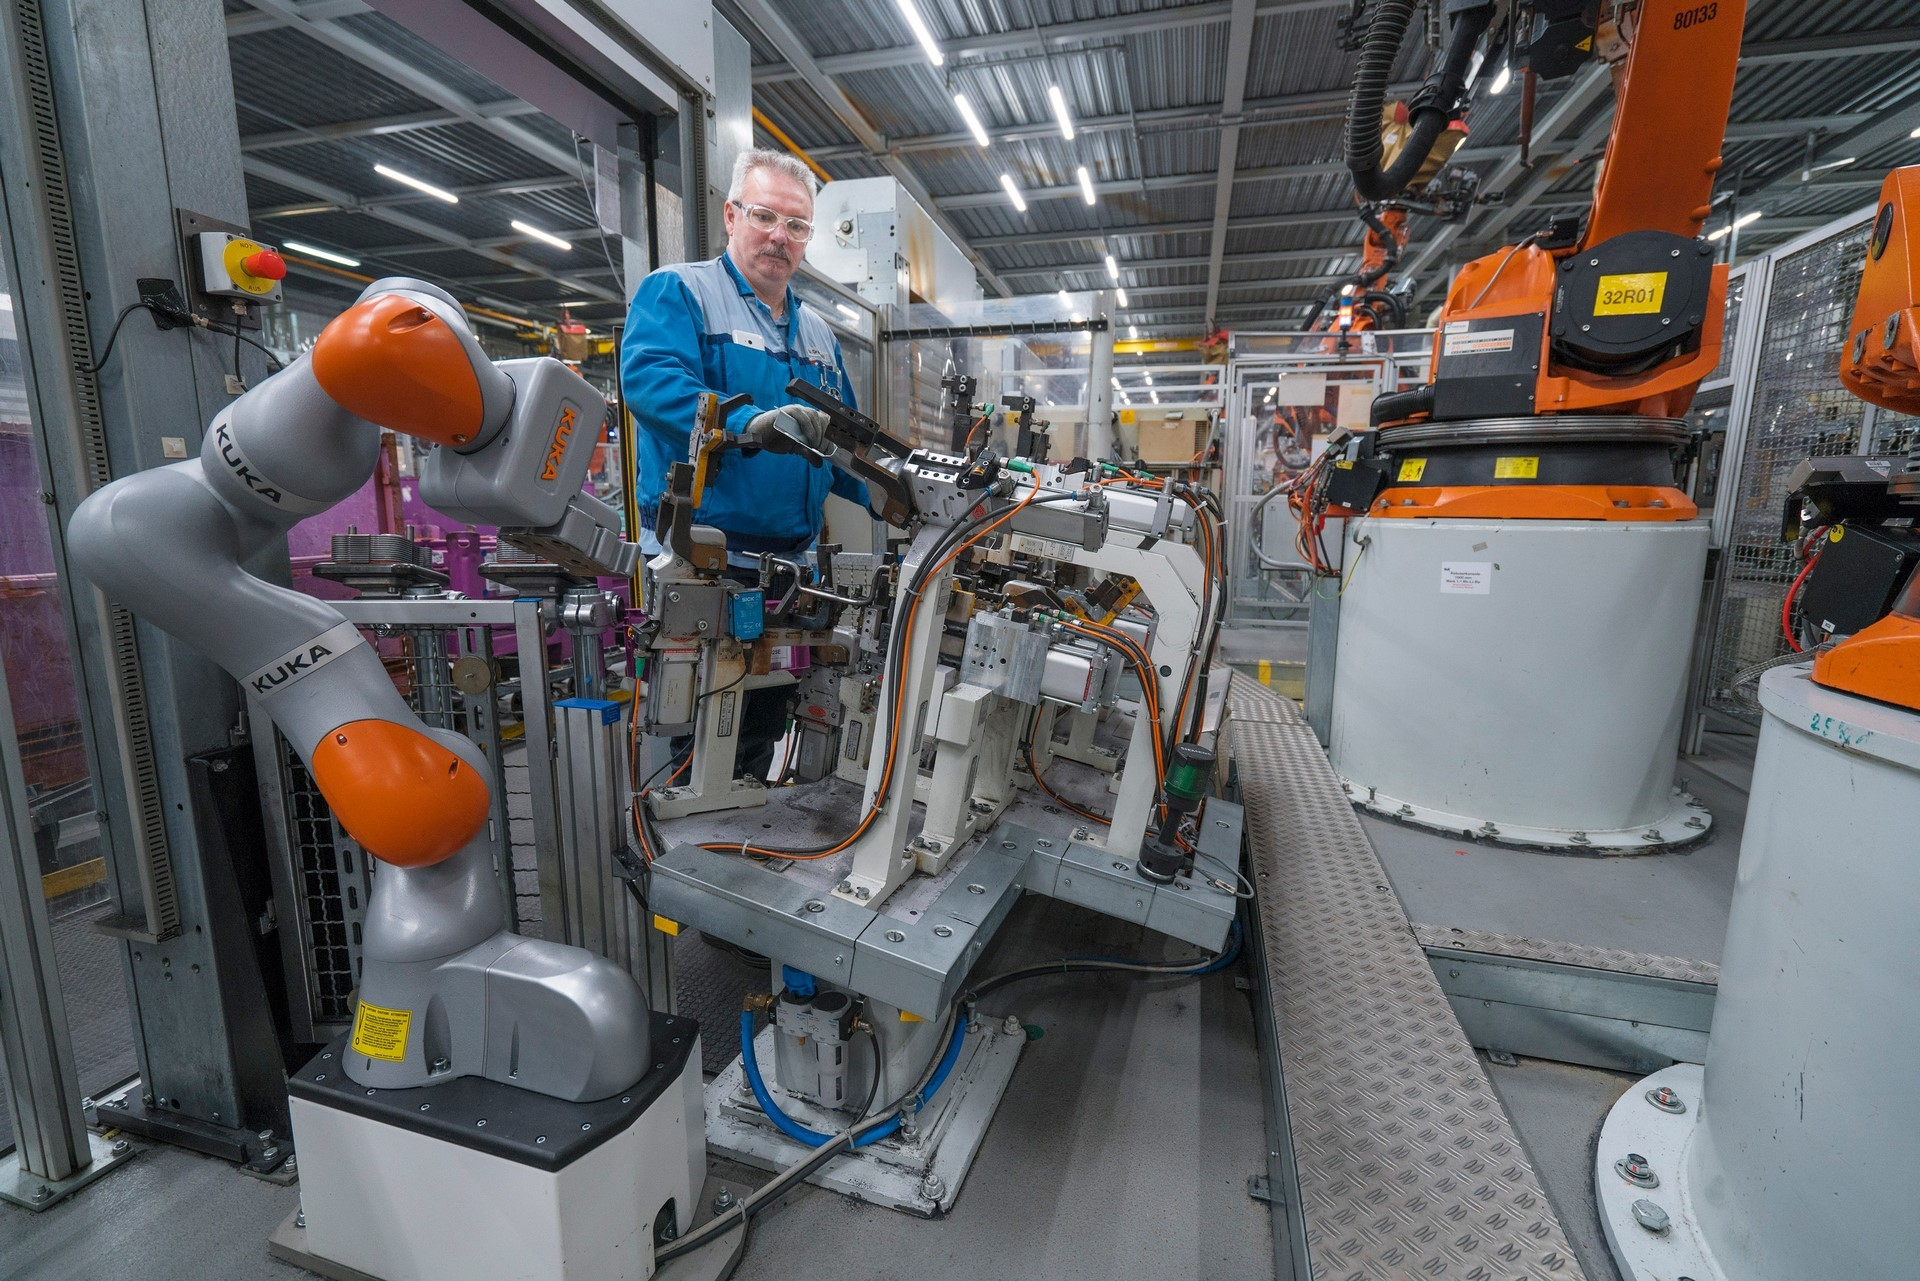 BMW humans robots (39)